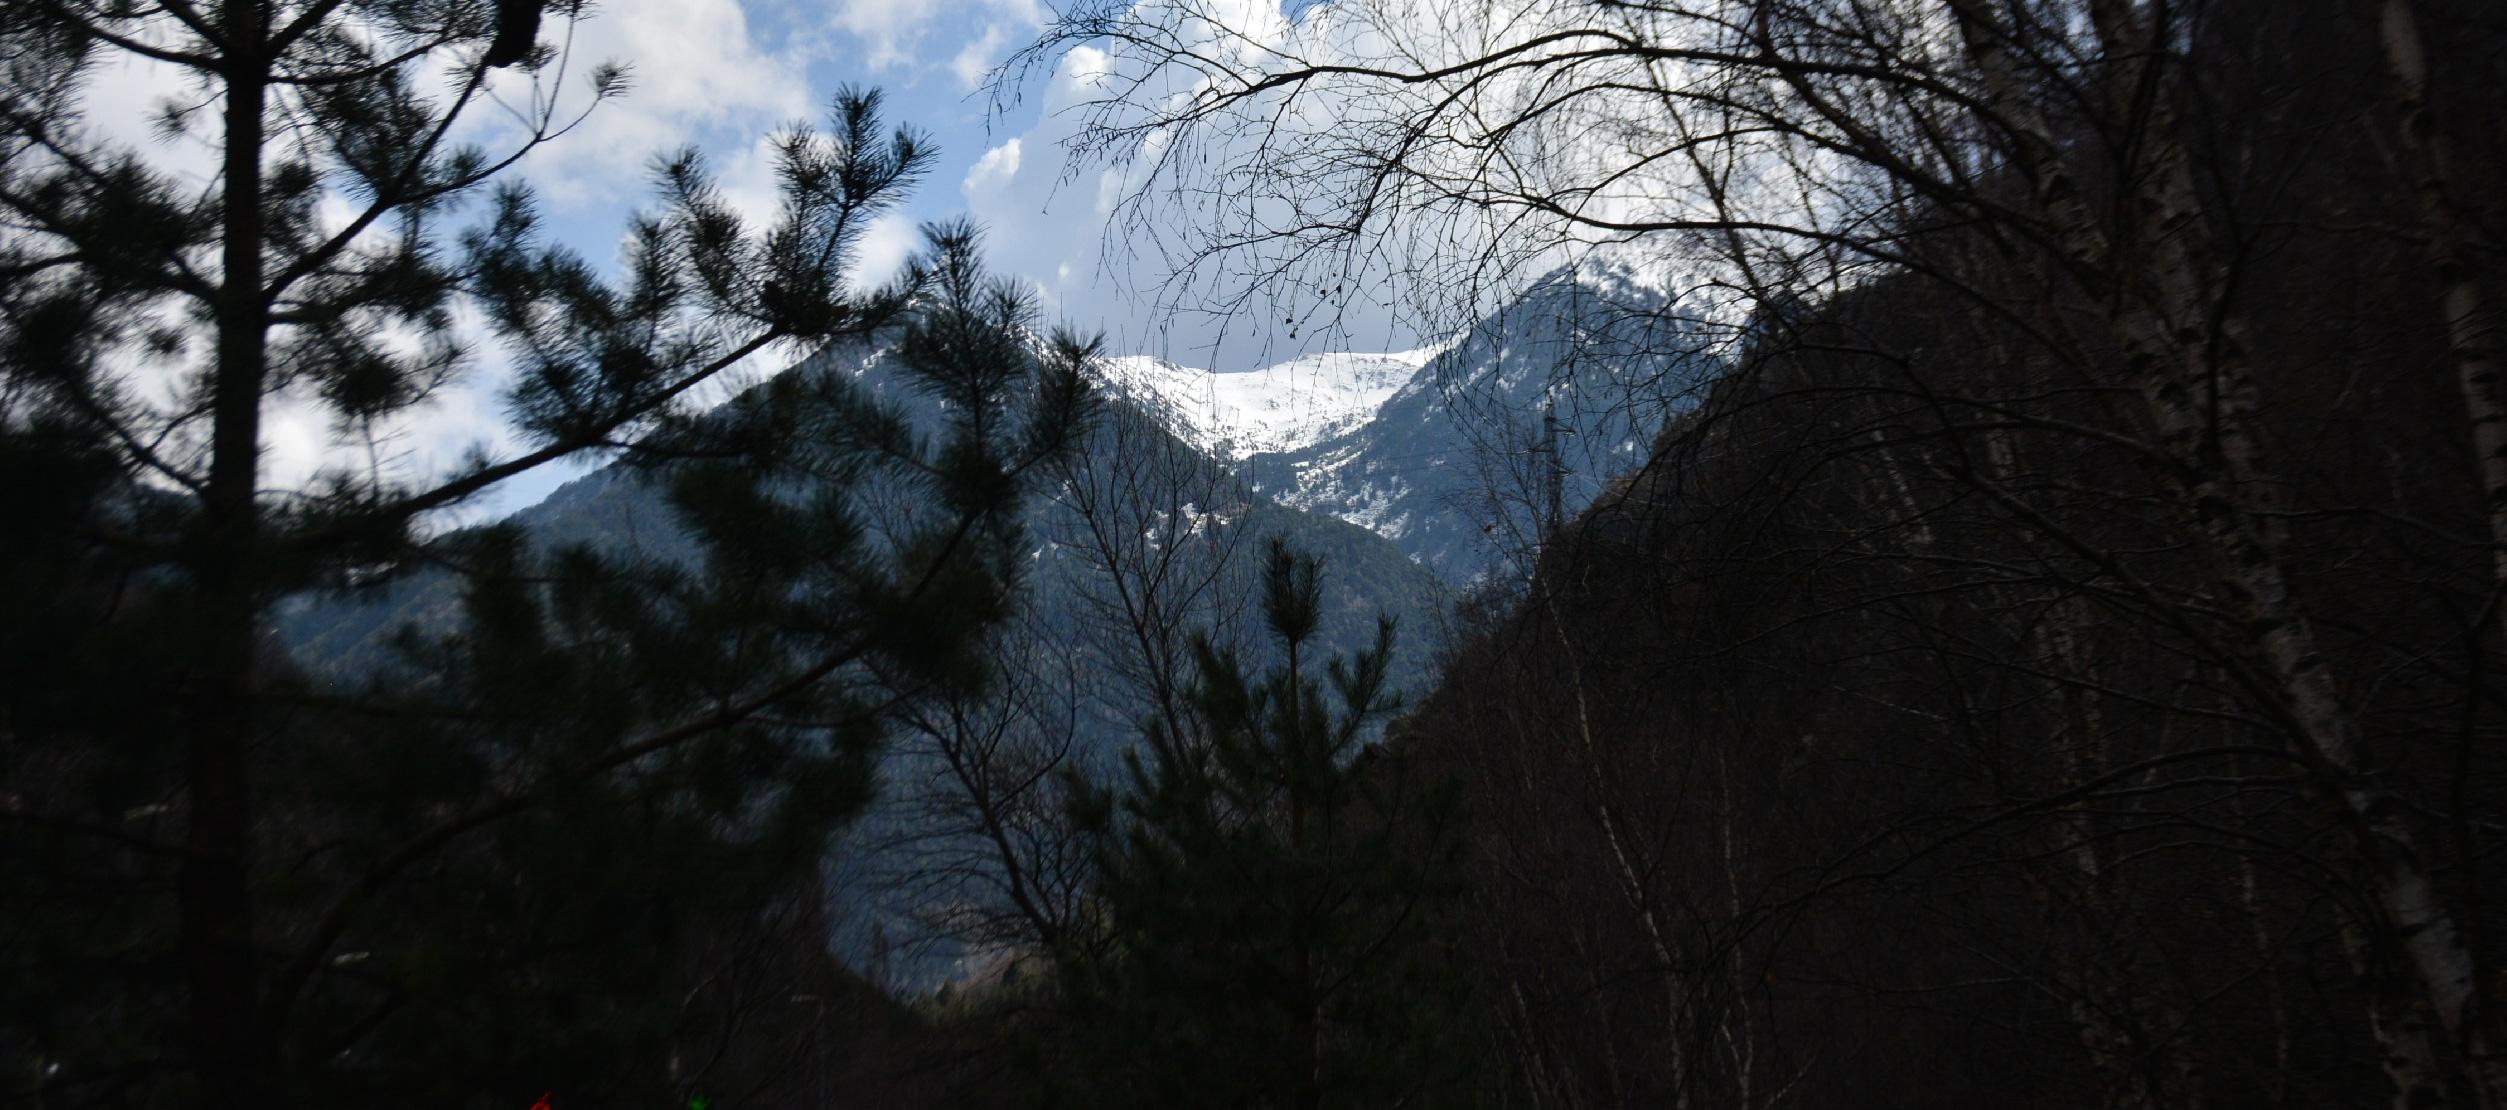 Andorra: vivir entre montañas.